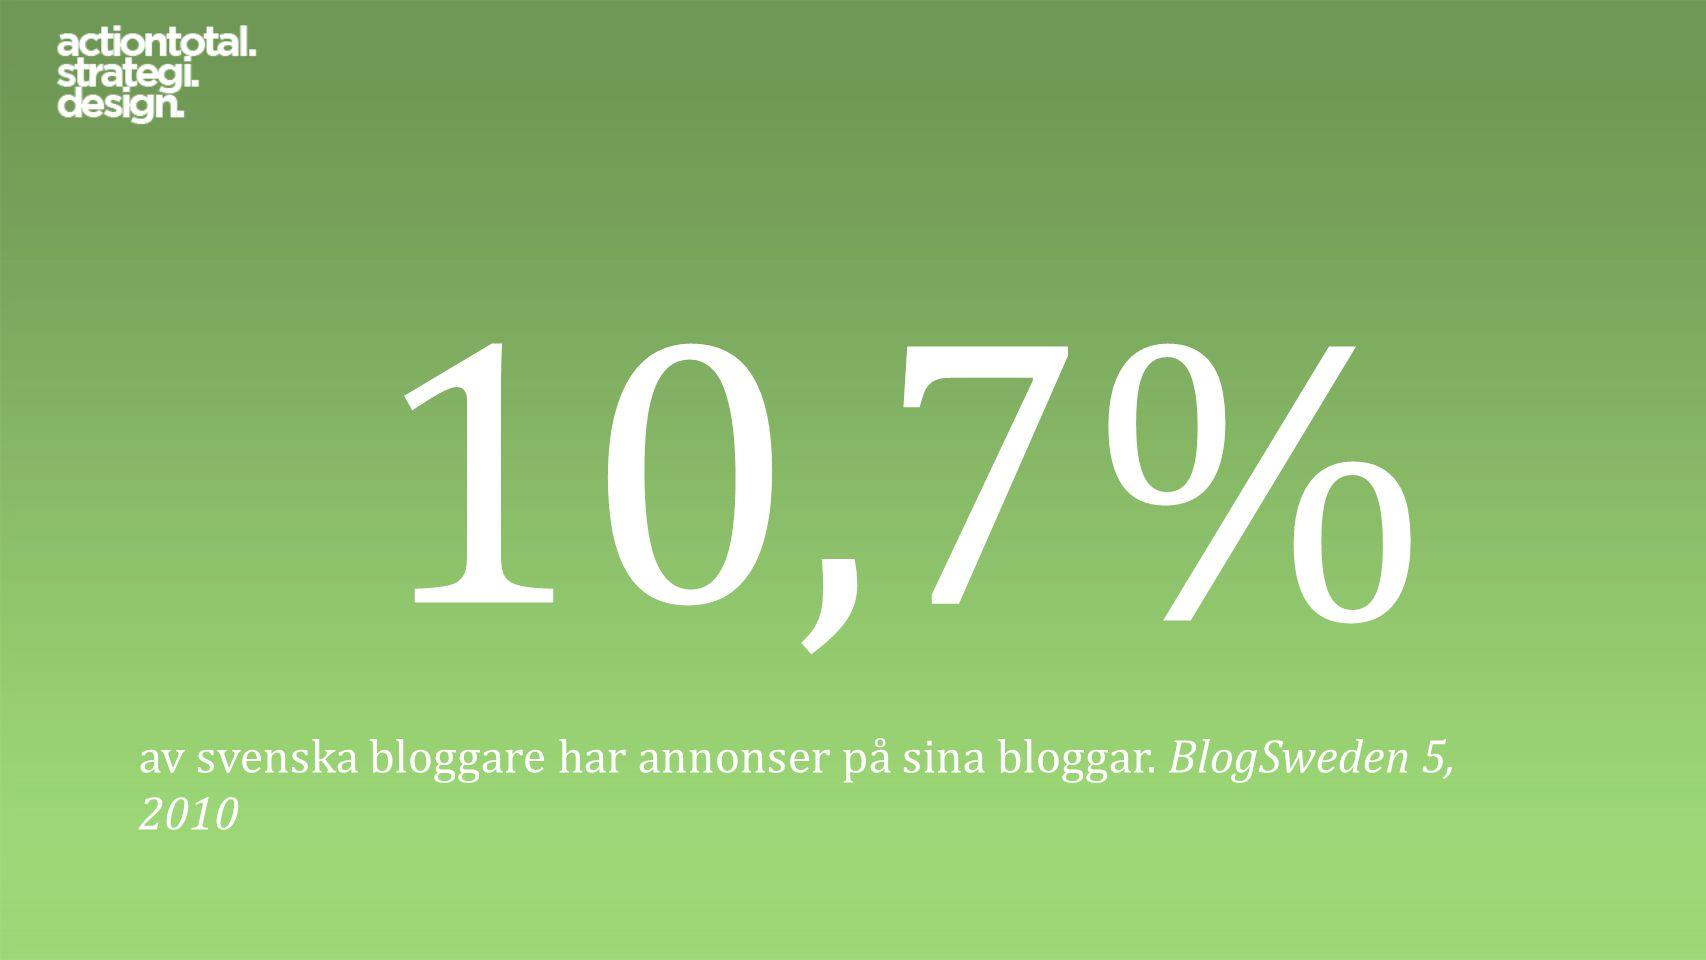 10,7% av svenska bloggare har annonser på sina bloggar. BlogSweden 5, 2010